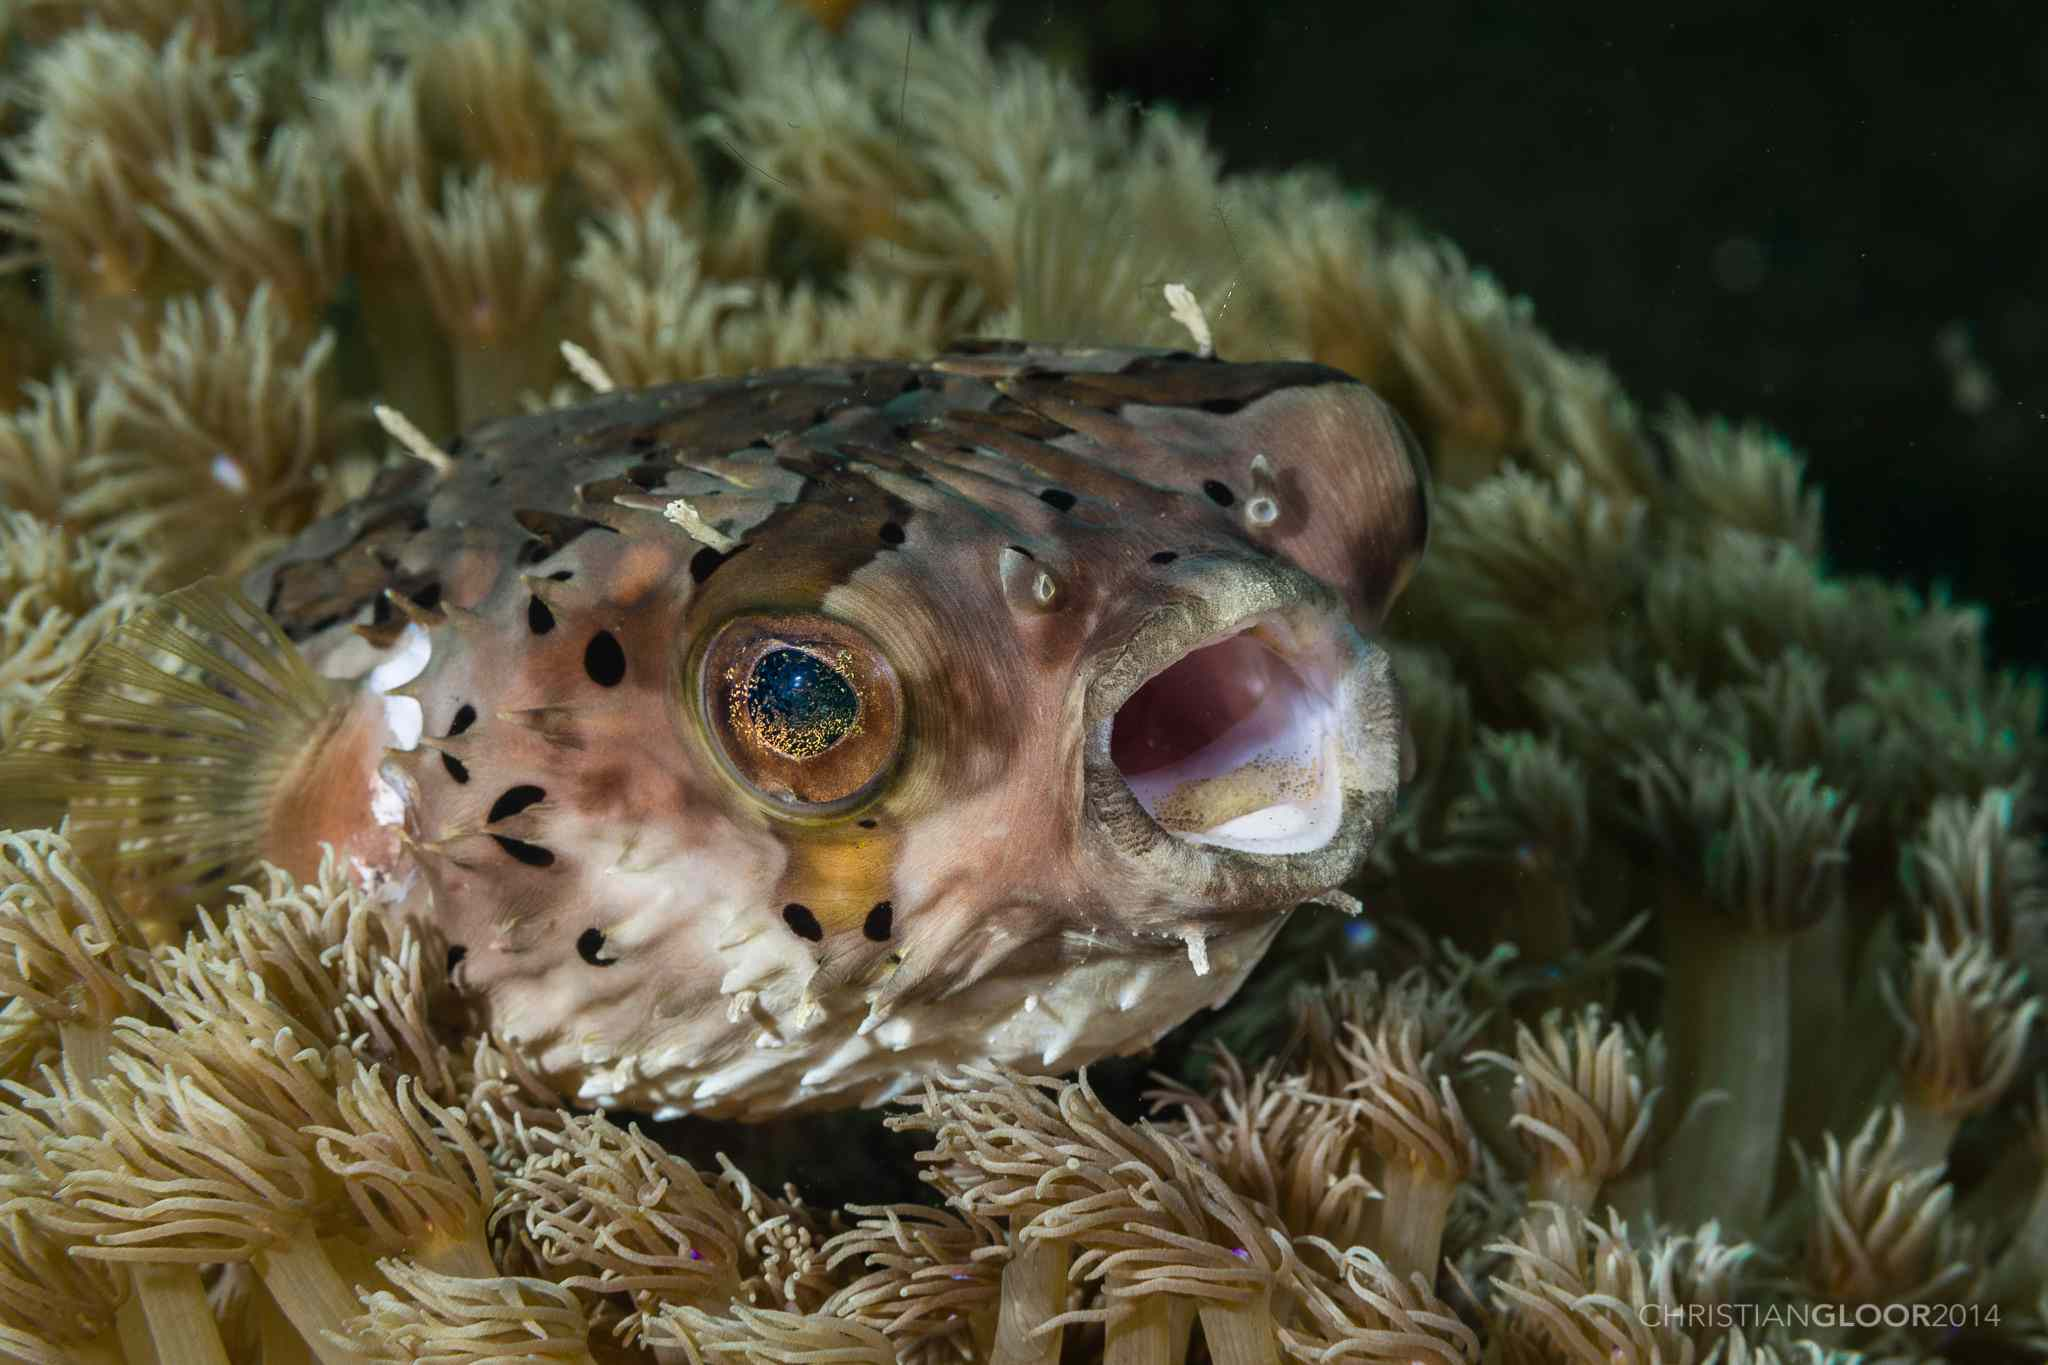 Freckled Porcupinefish (Diodon holocanthus), Wakatobi Dive Resort, Indonesia